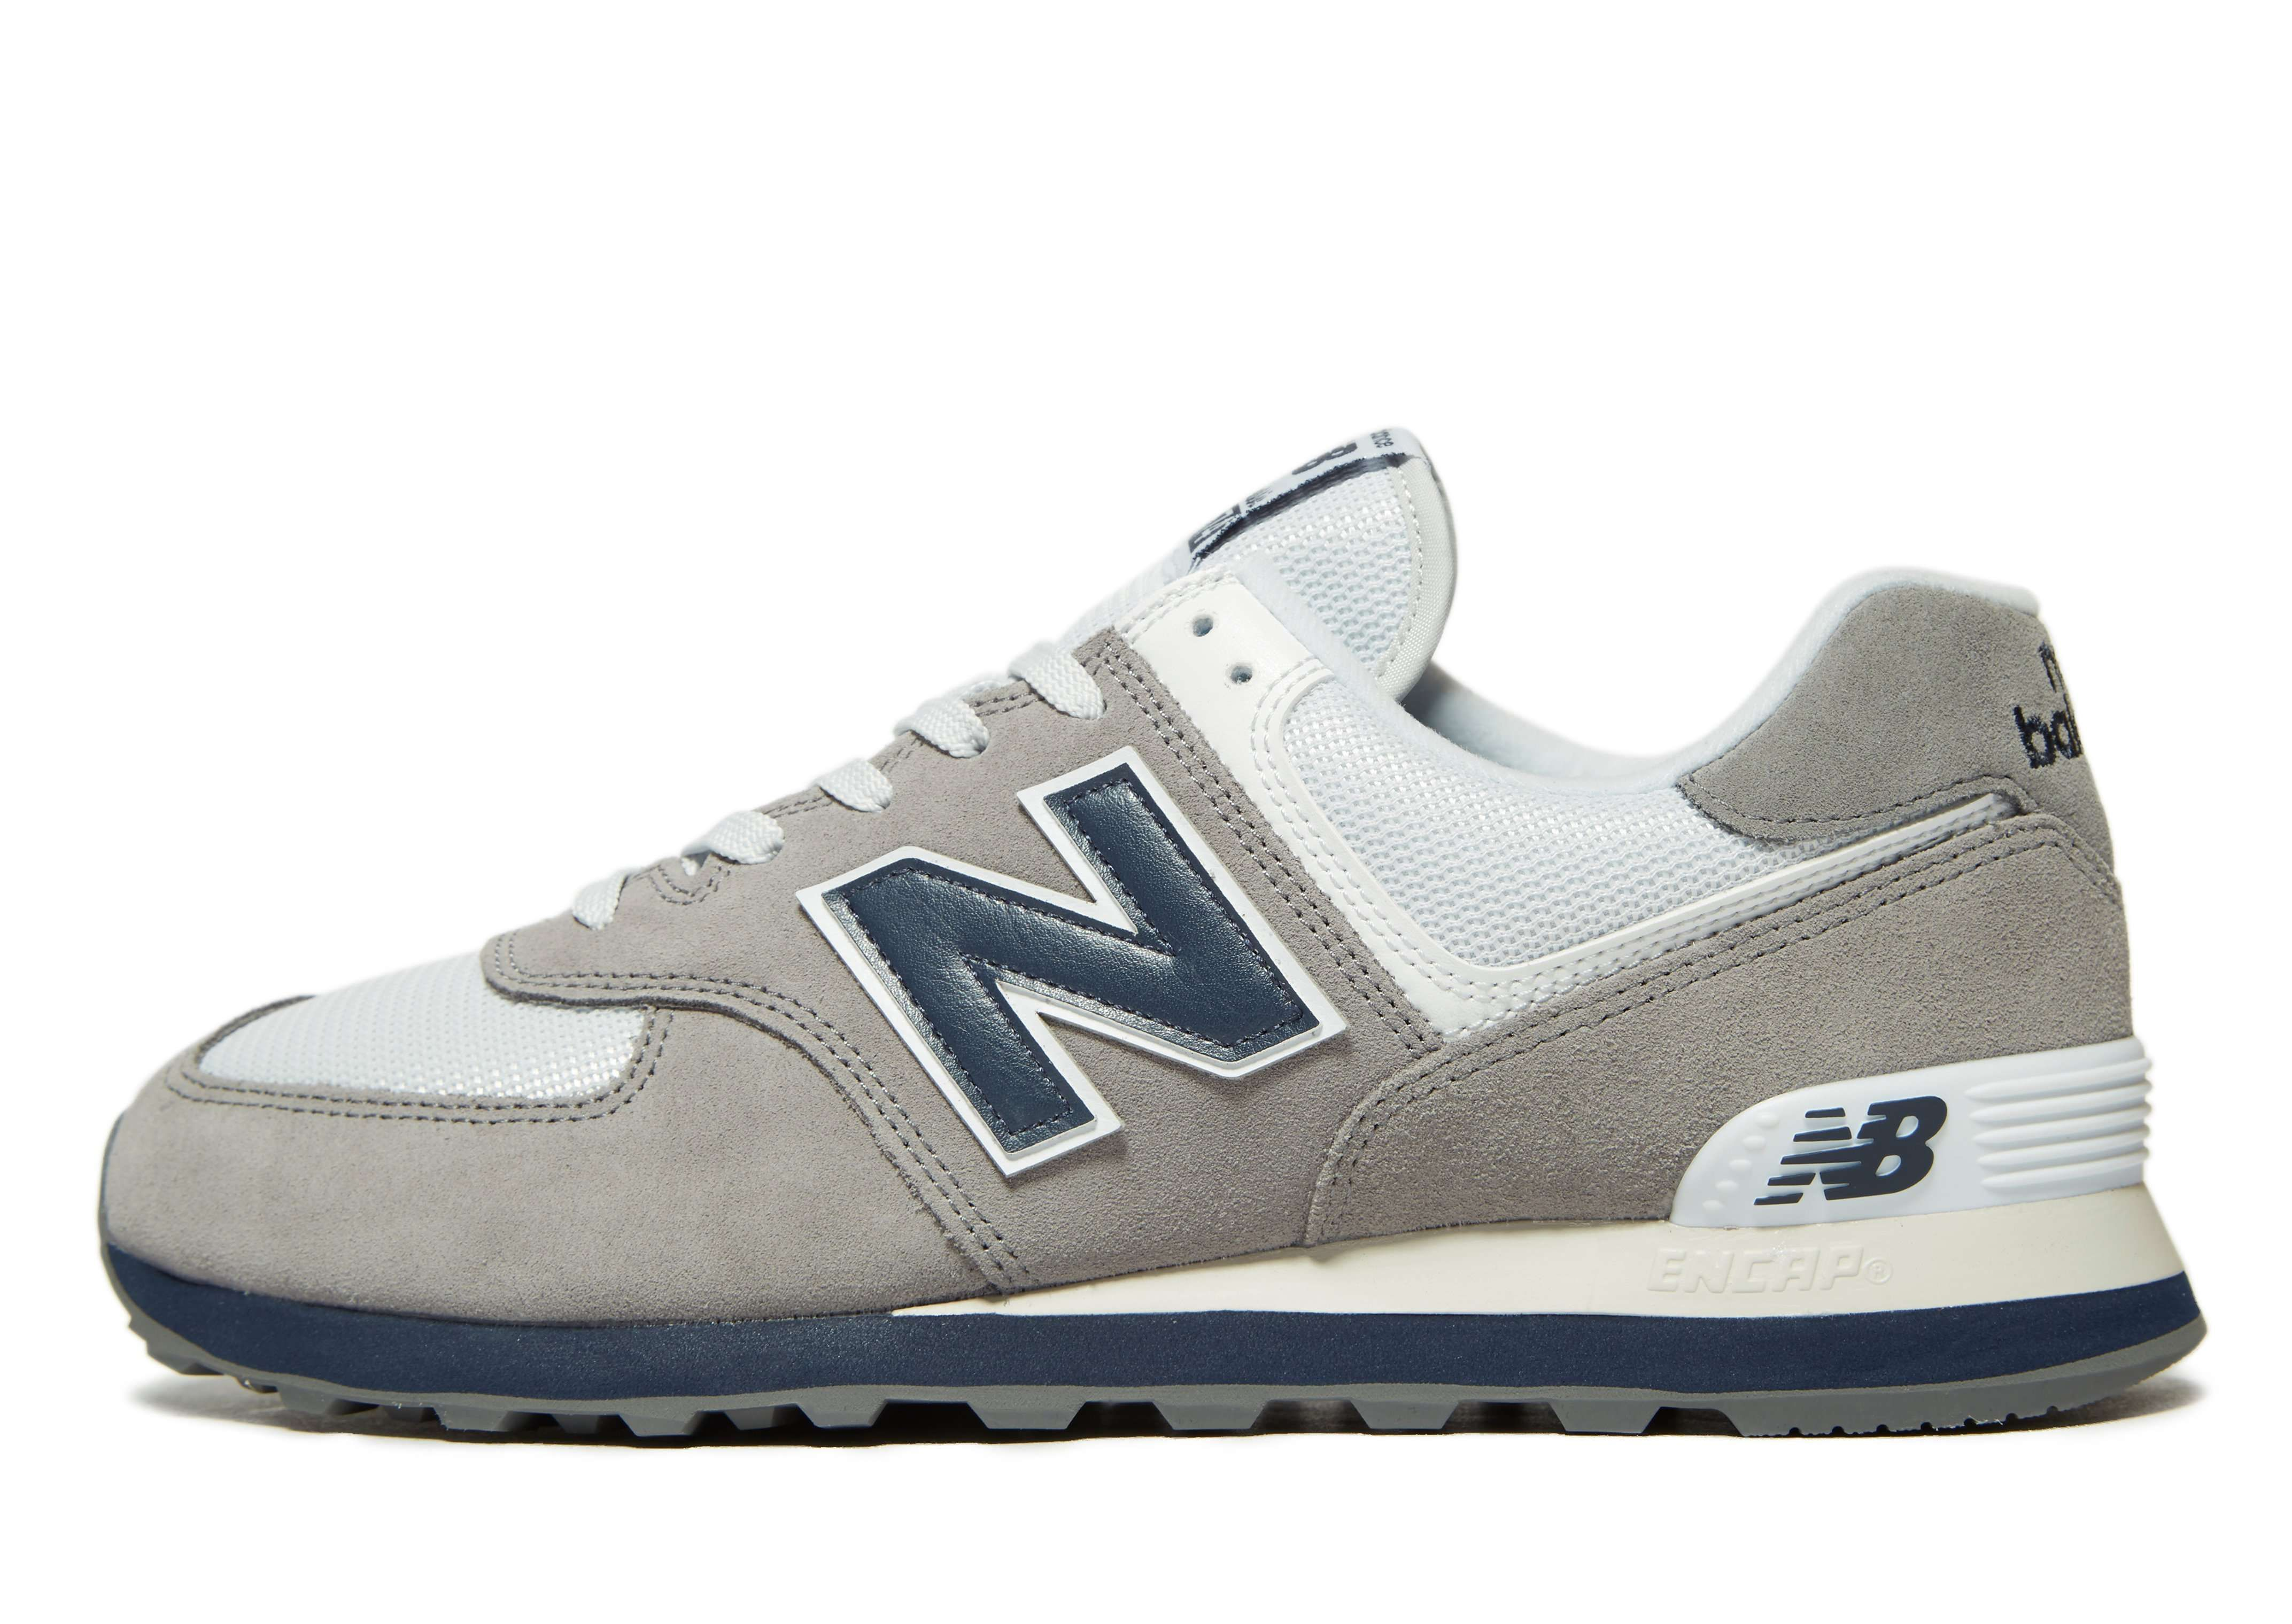 New Balance 574 V2 with JD Sports